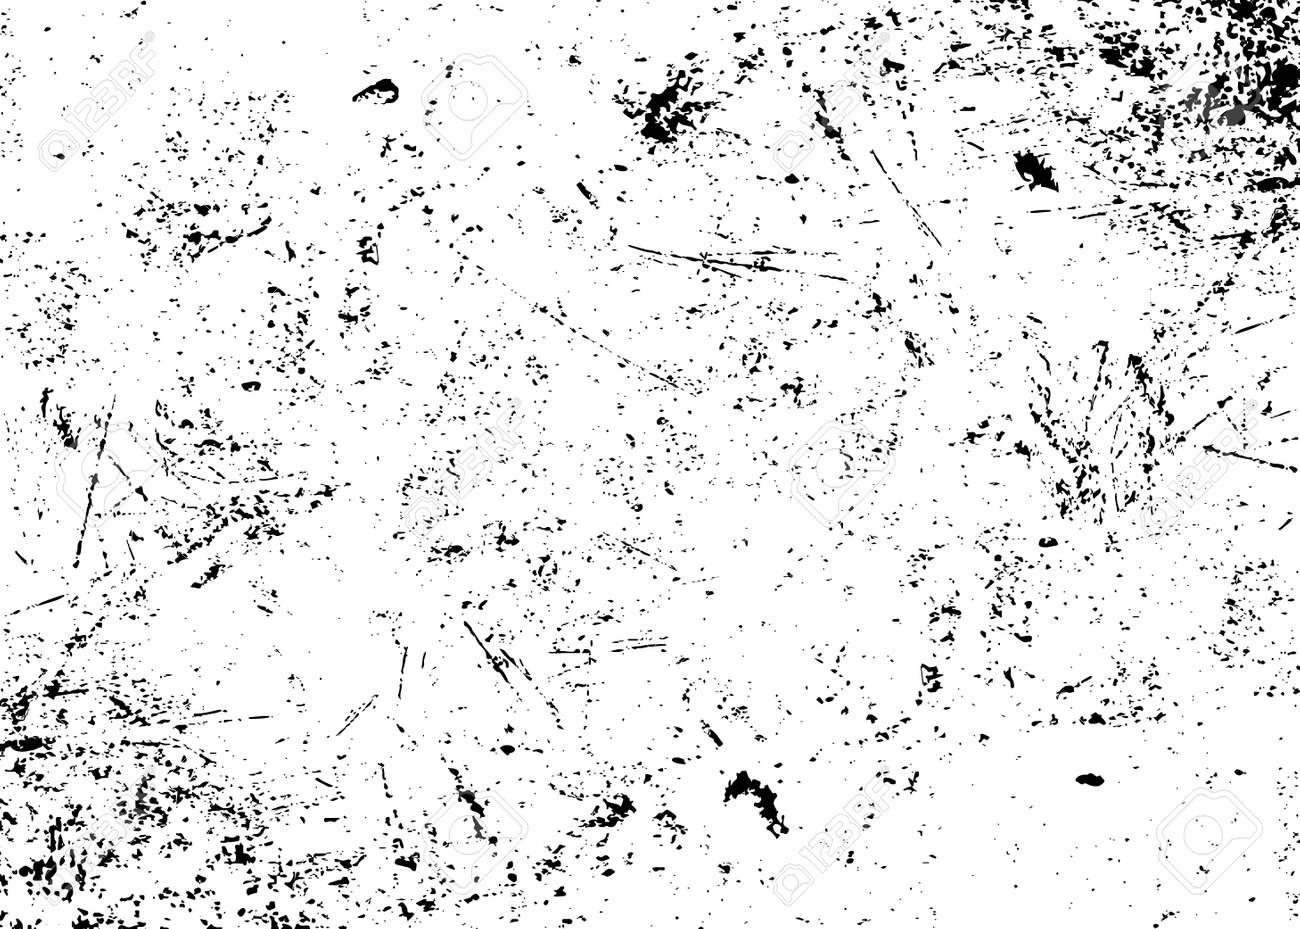 grunge texture white and